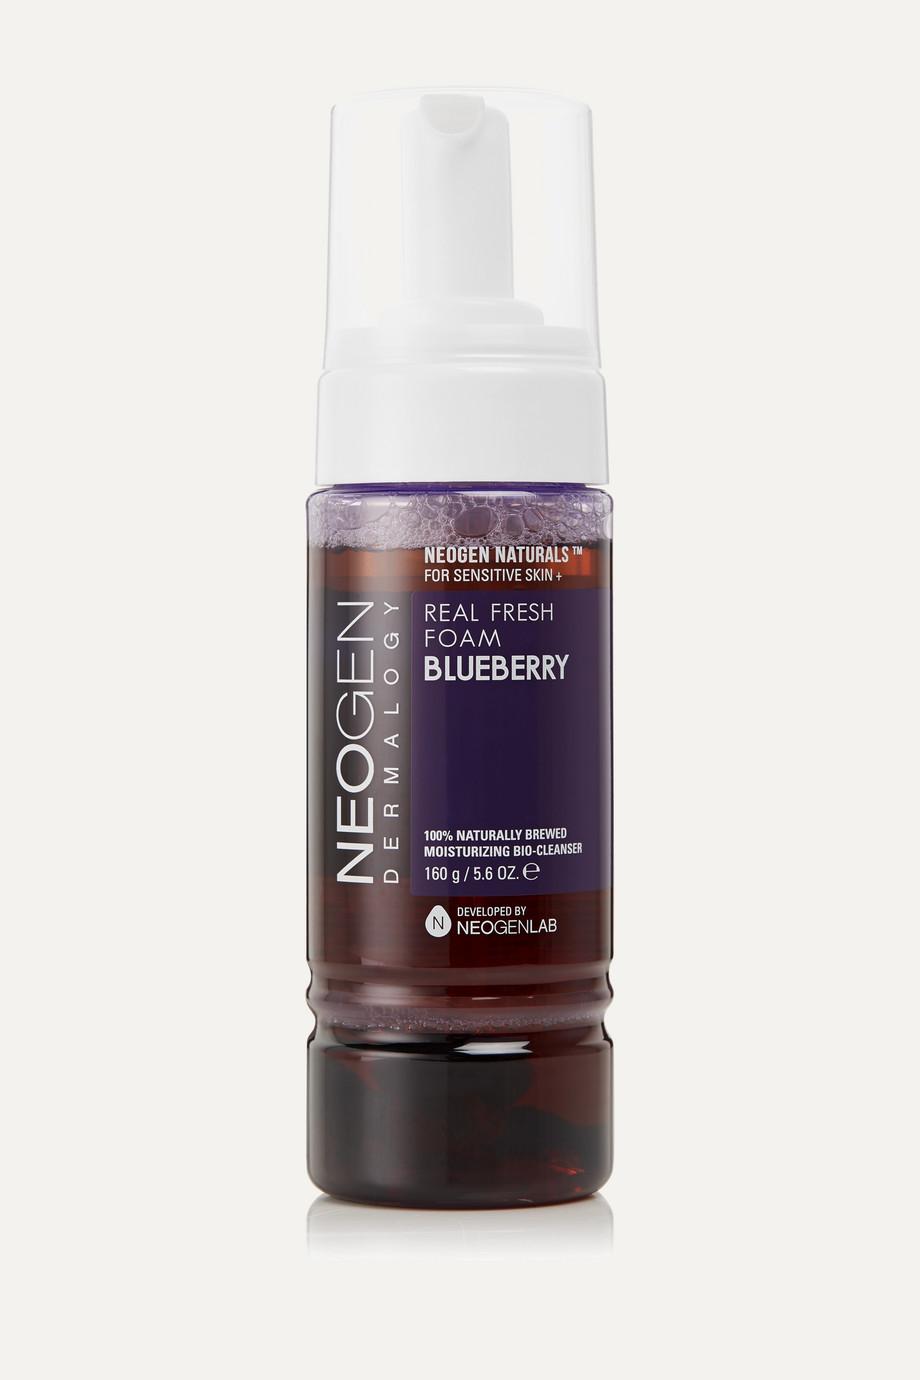 Neogen Dermalogy Real Fresh Foam - Blueberry, 160g